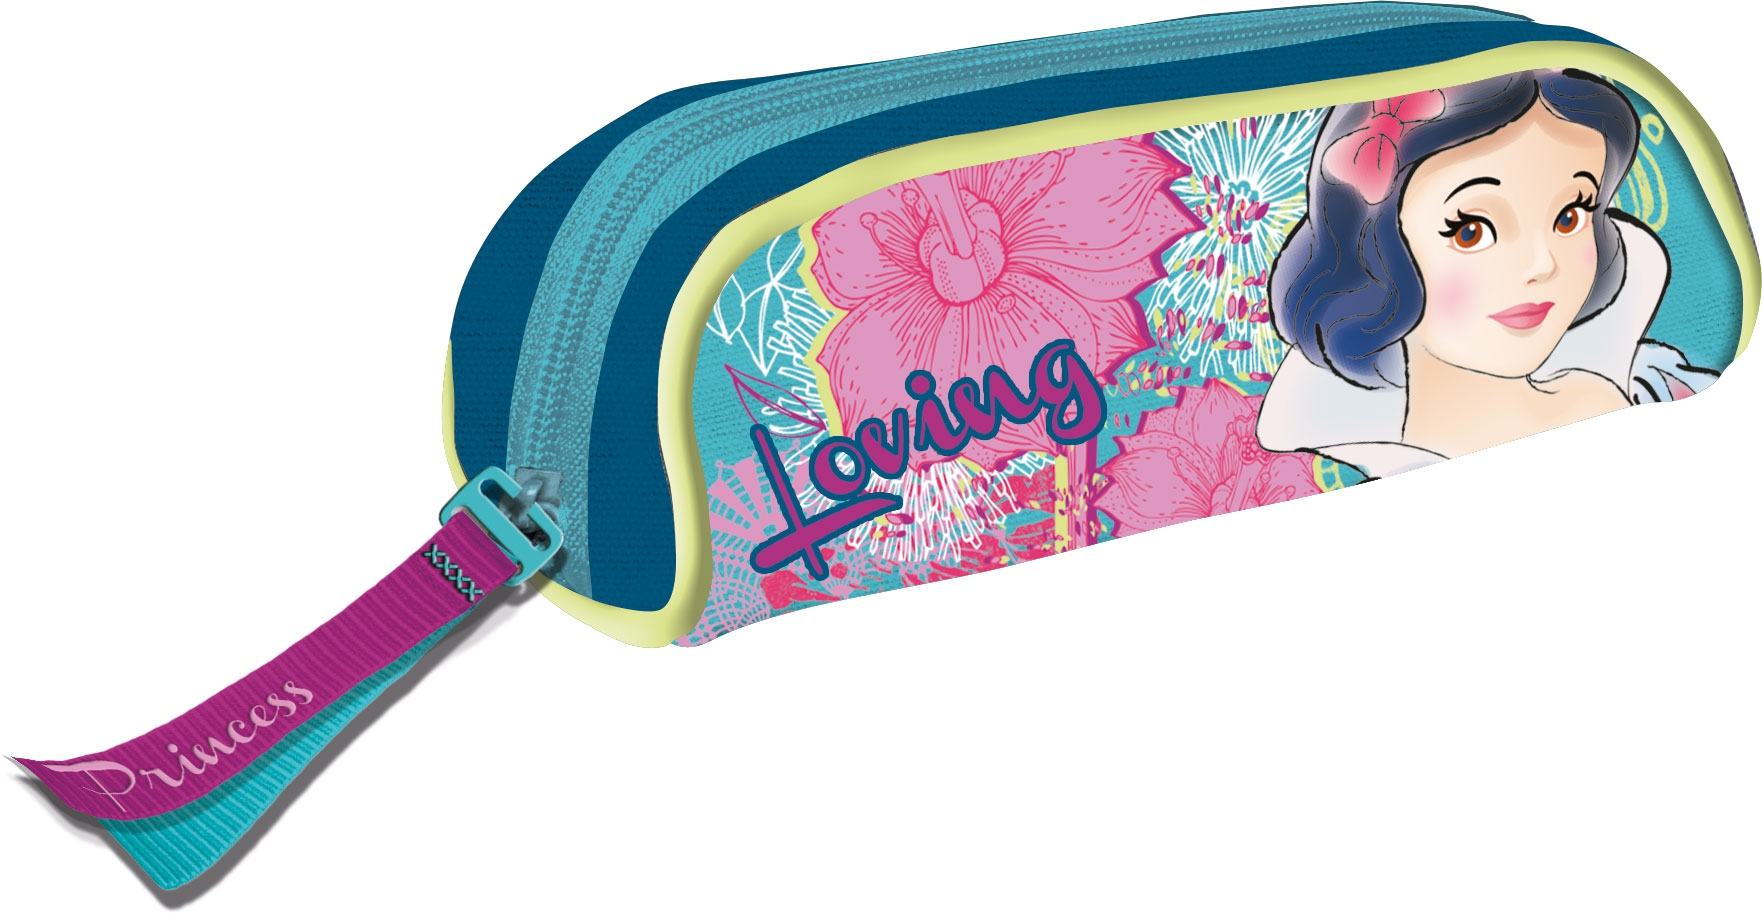 Канцелярия Princess Пенал Disney Princess на молнии пенал на молнии лиса 20 8см силикон пвх бокс 12 22716 ml bd2116 1